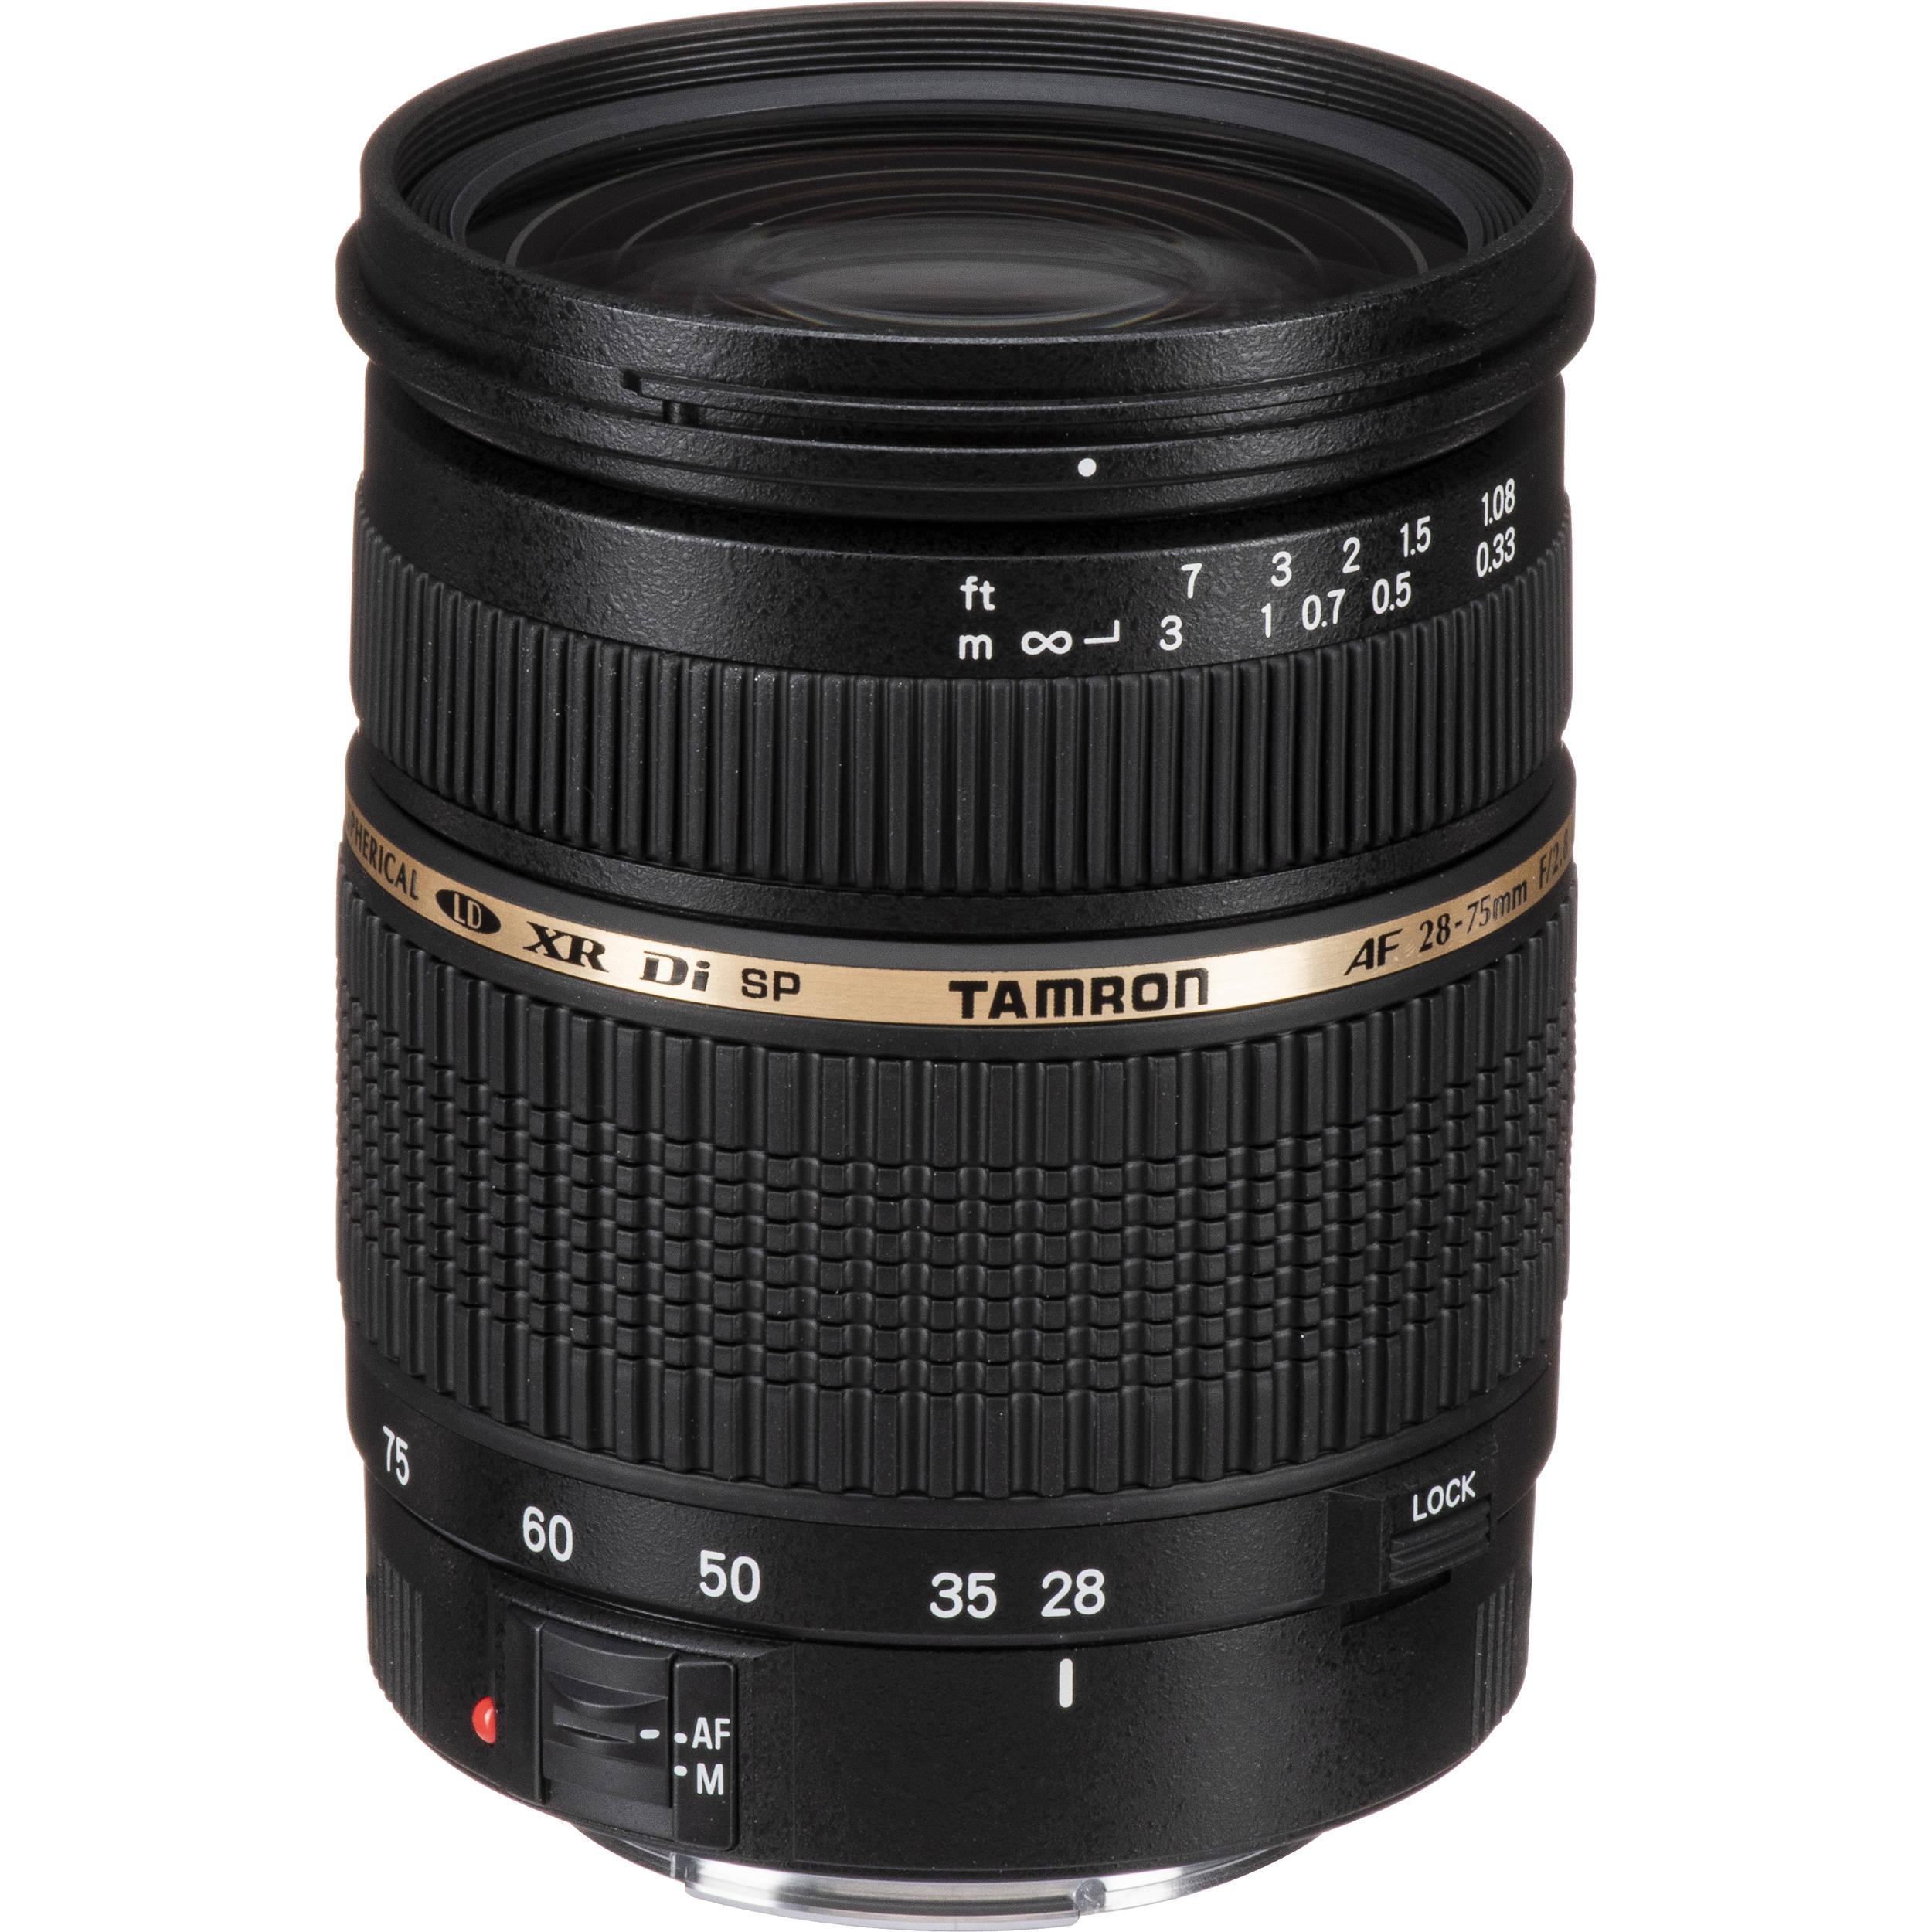 Tamron AF 28-75mm f//2.8 SP XR Di LD Aspherical for Canon Digital SLR Cameras IF Model A09E